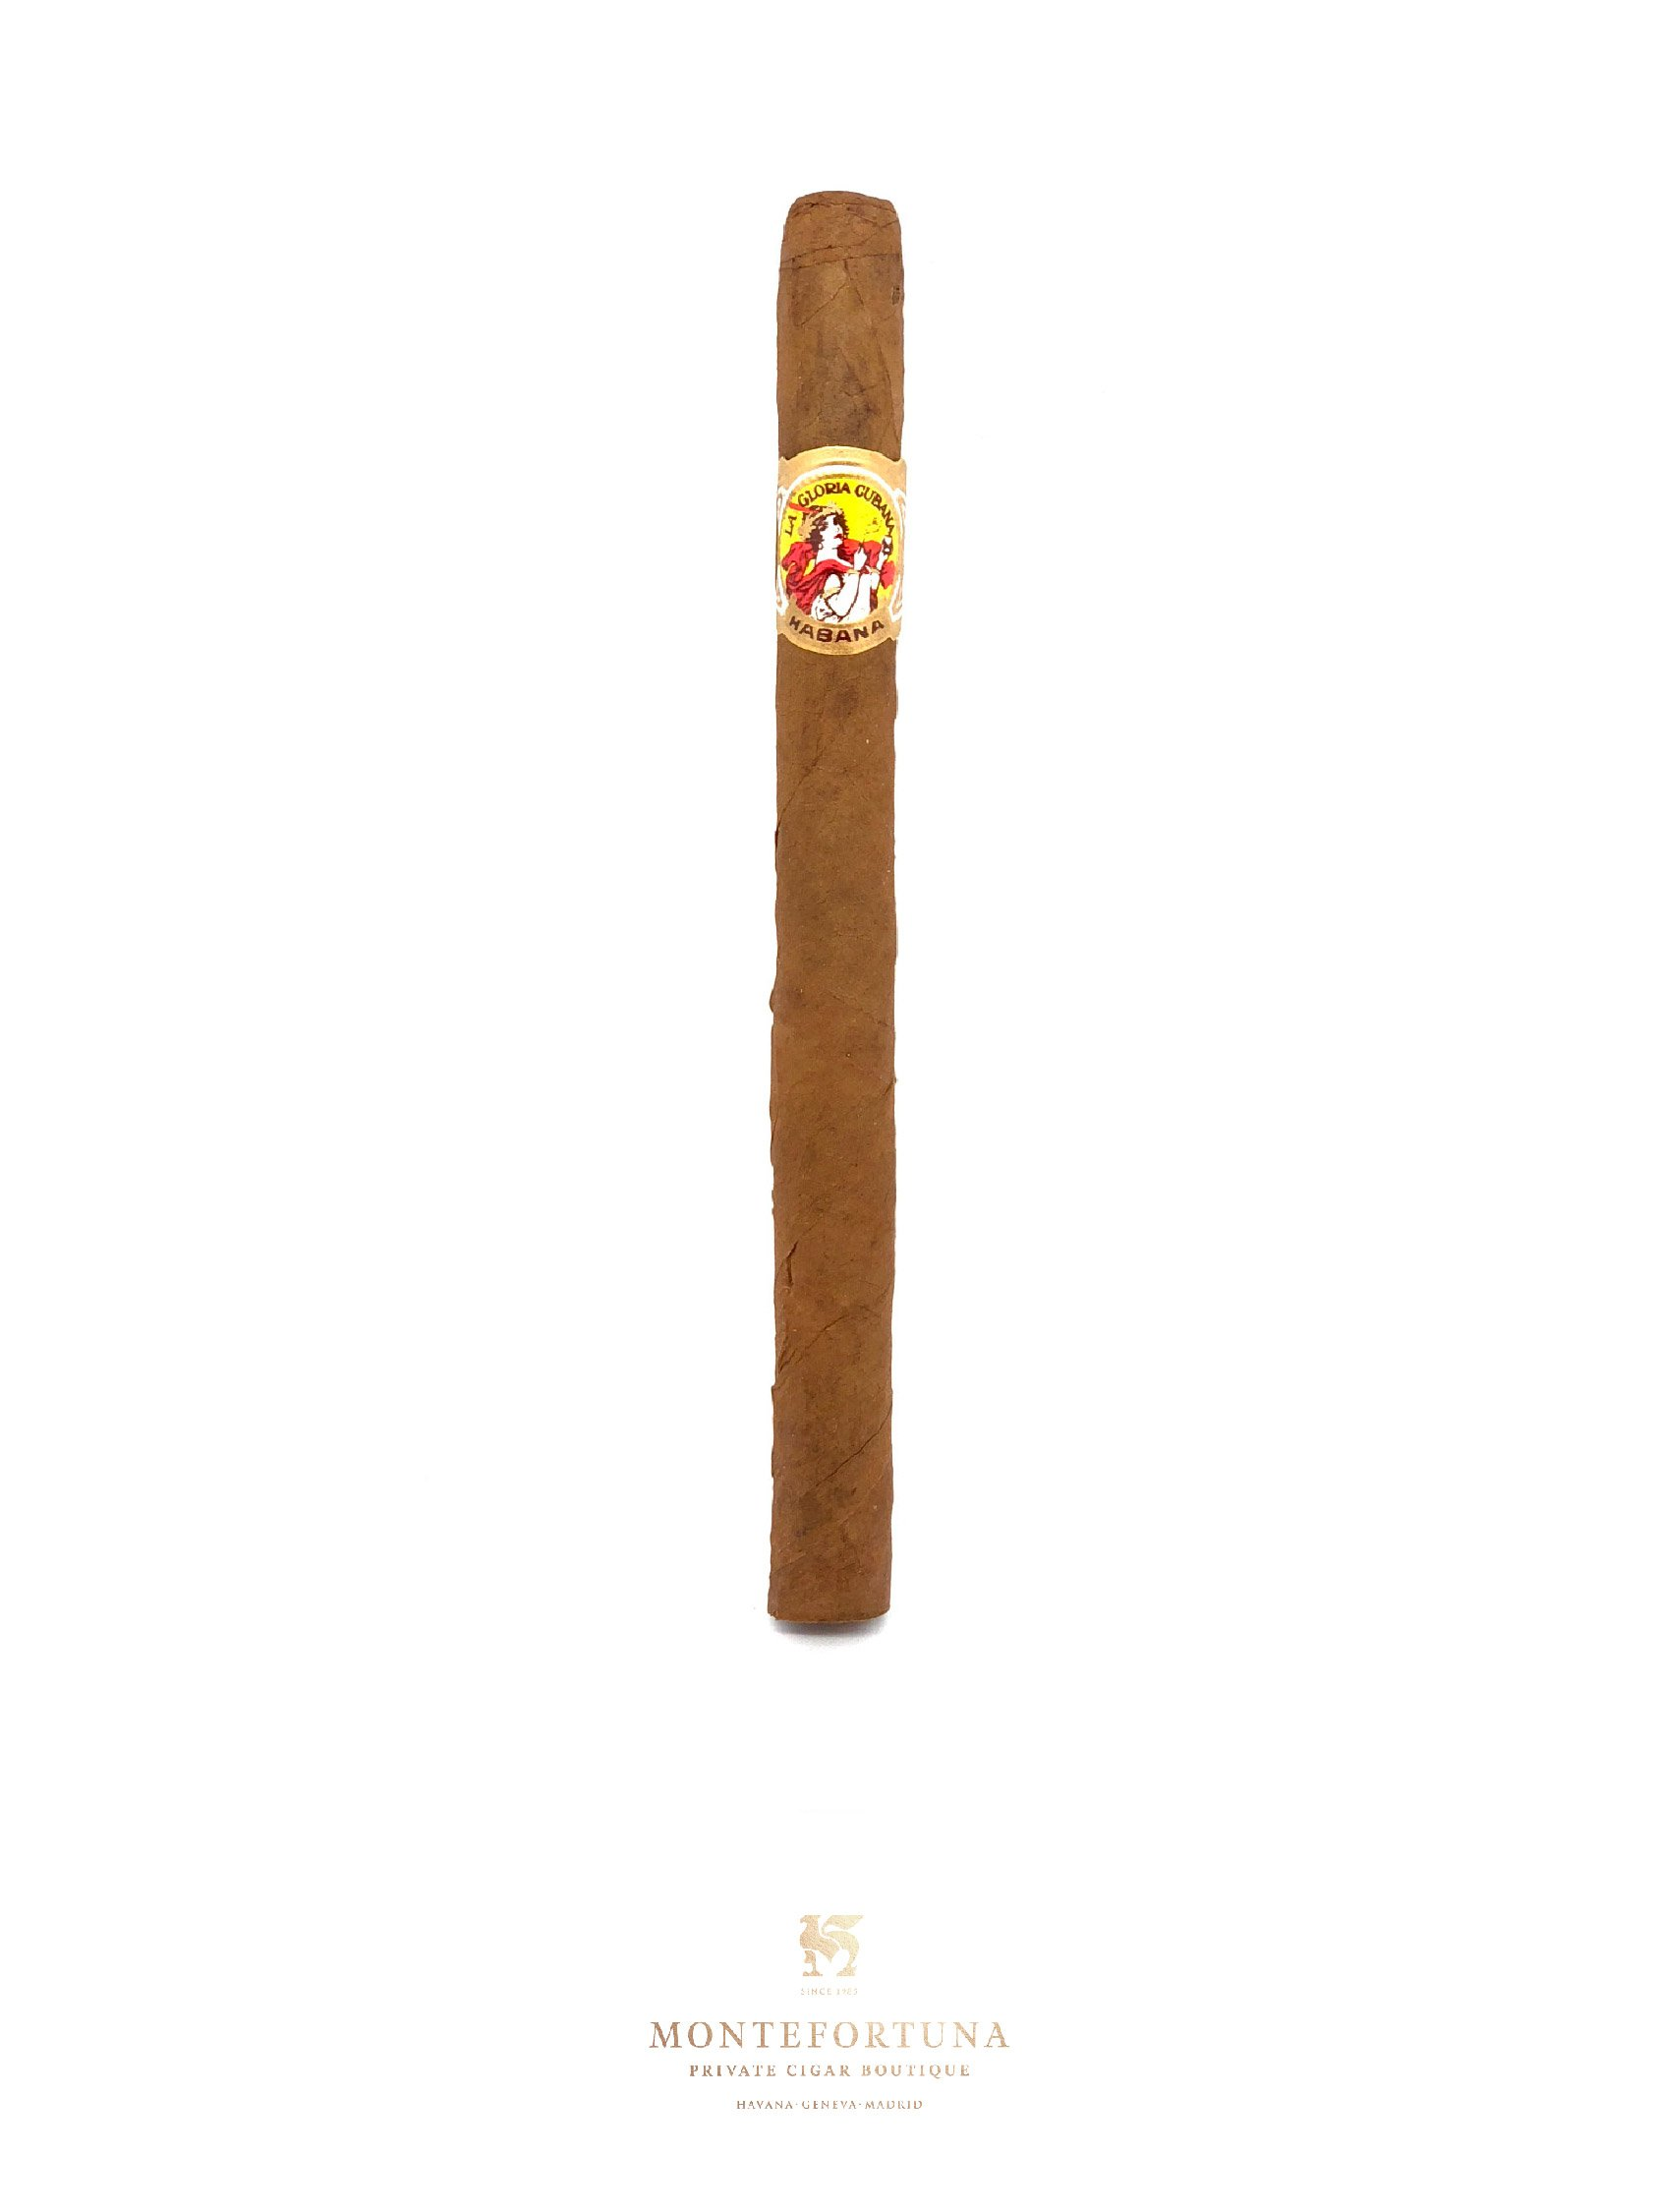 top 5 cigars under 10$ the best cheap cuban cigars montefortunaprice 9\u20ac la gloria cubana medaille d\u0027or cheap cuban cigars